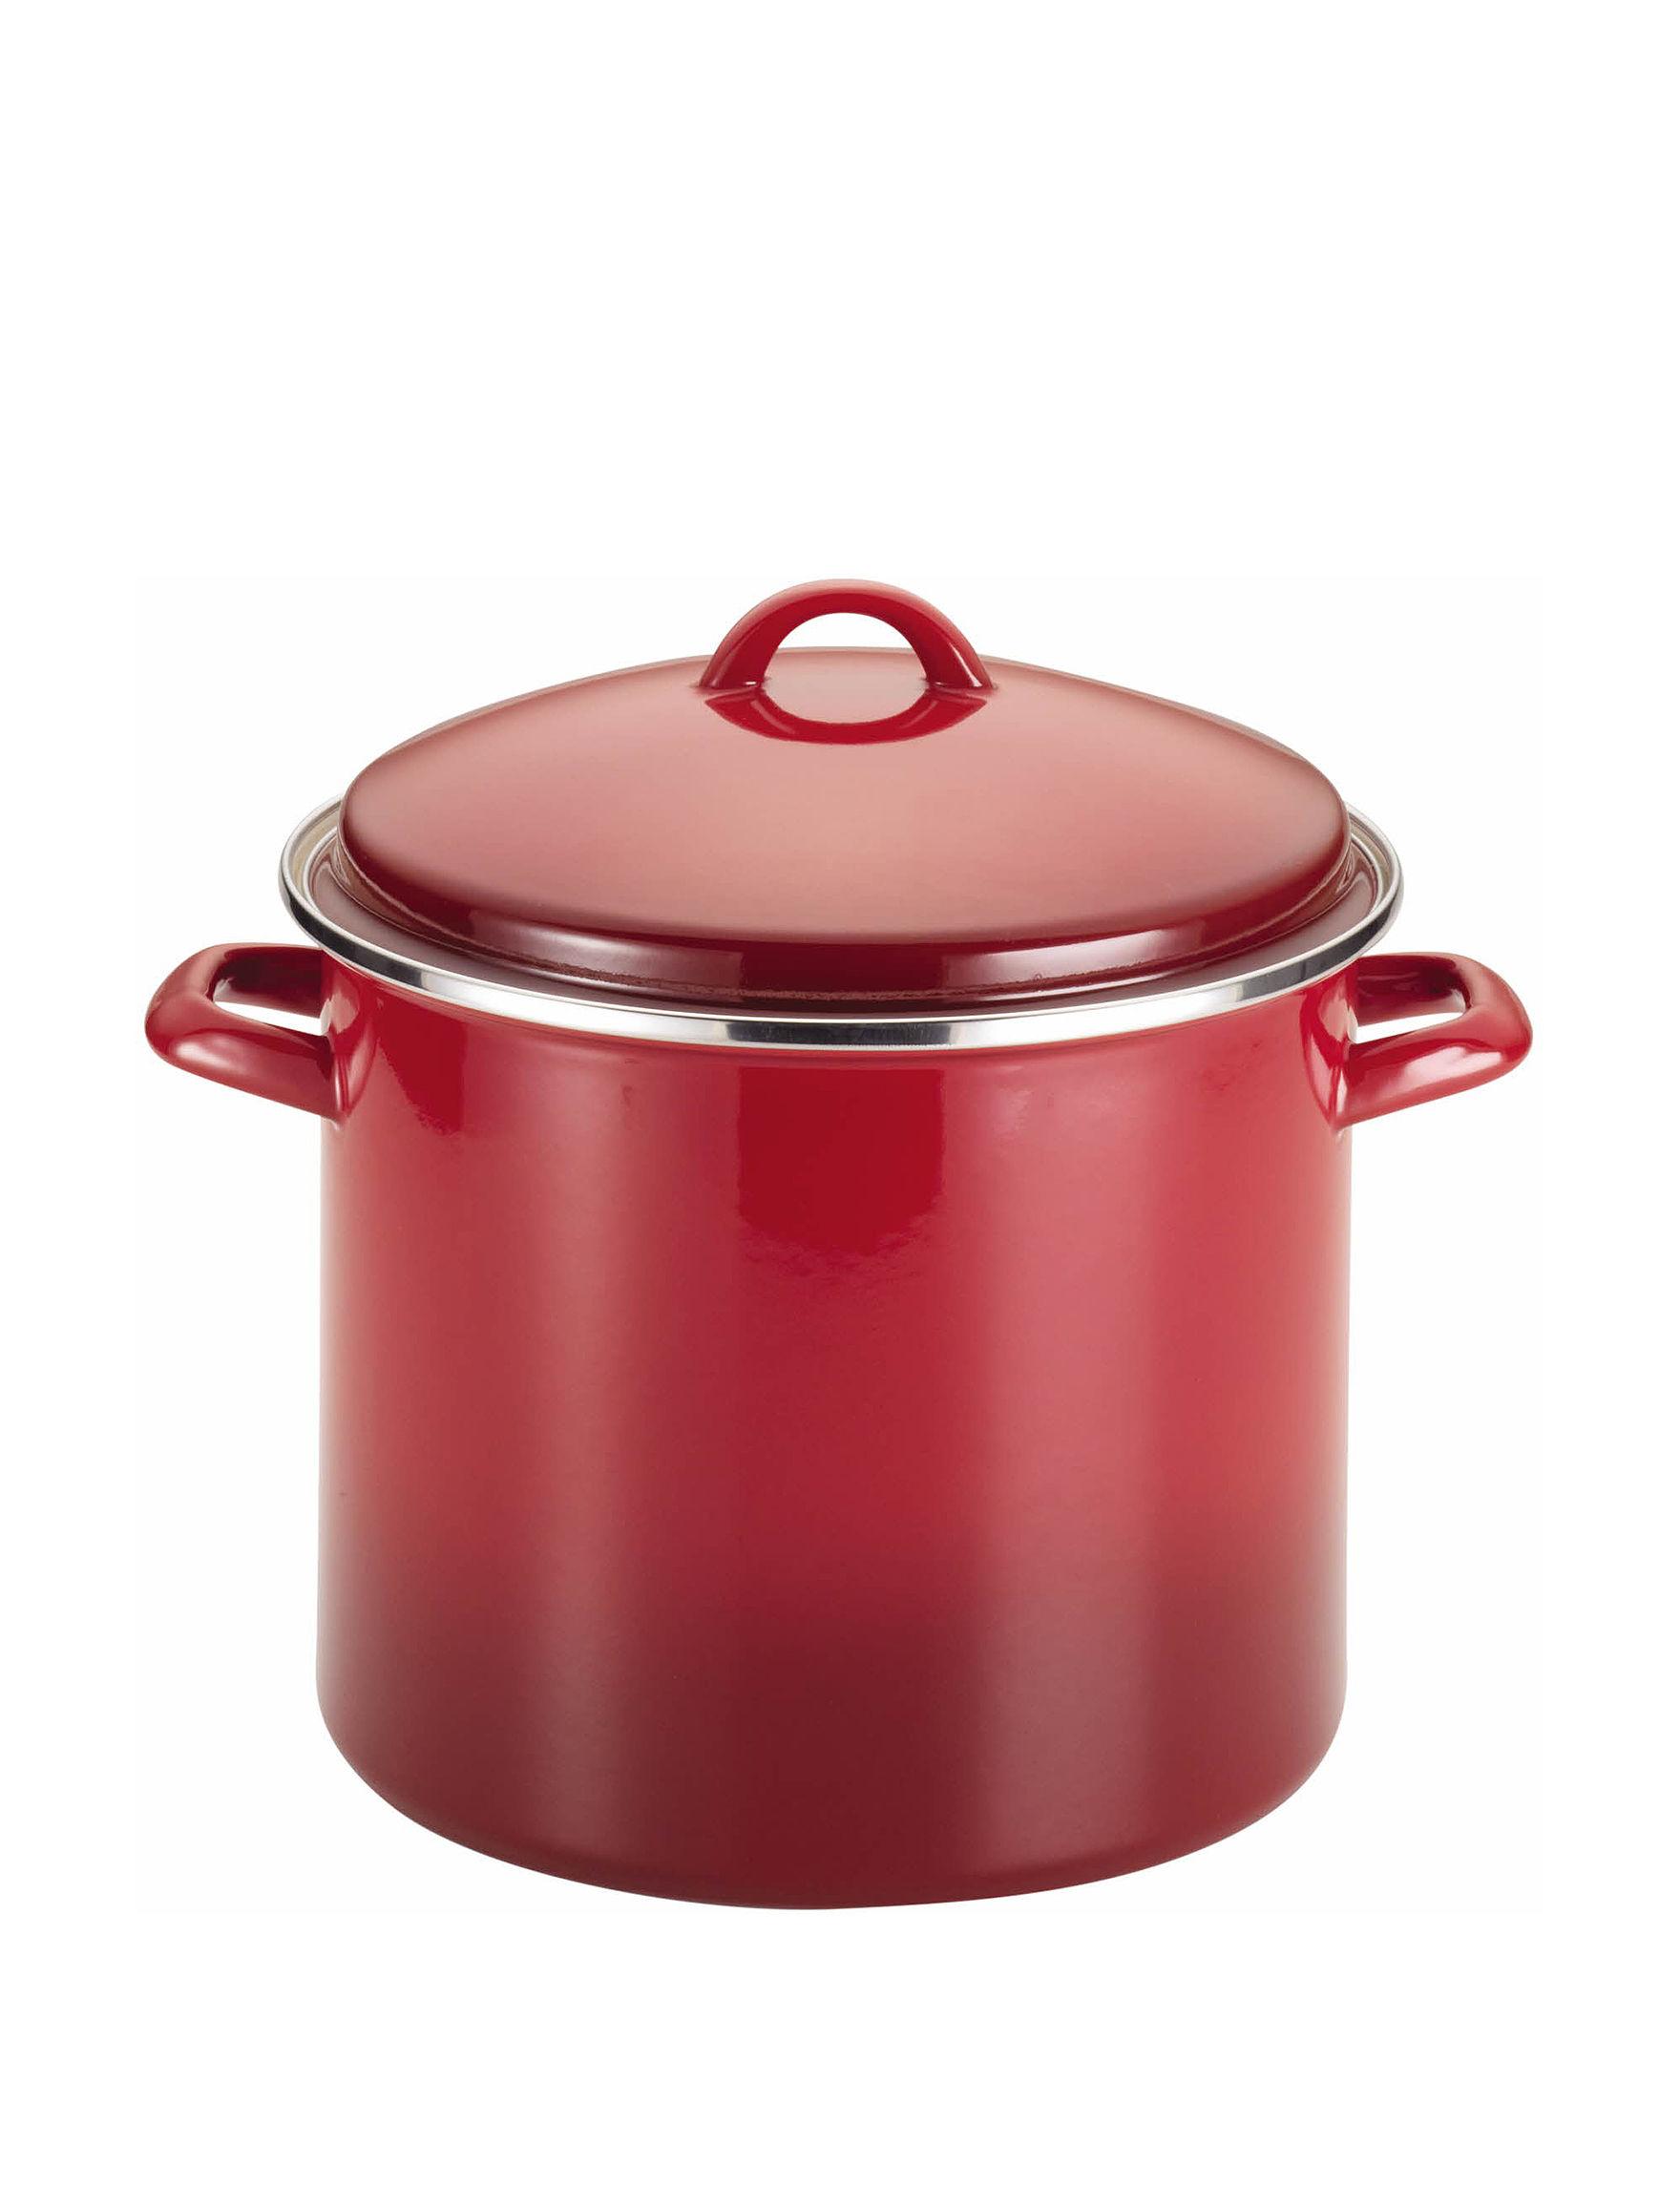 Rachael Ray Red Pots & Dutch Ovens Flatware